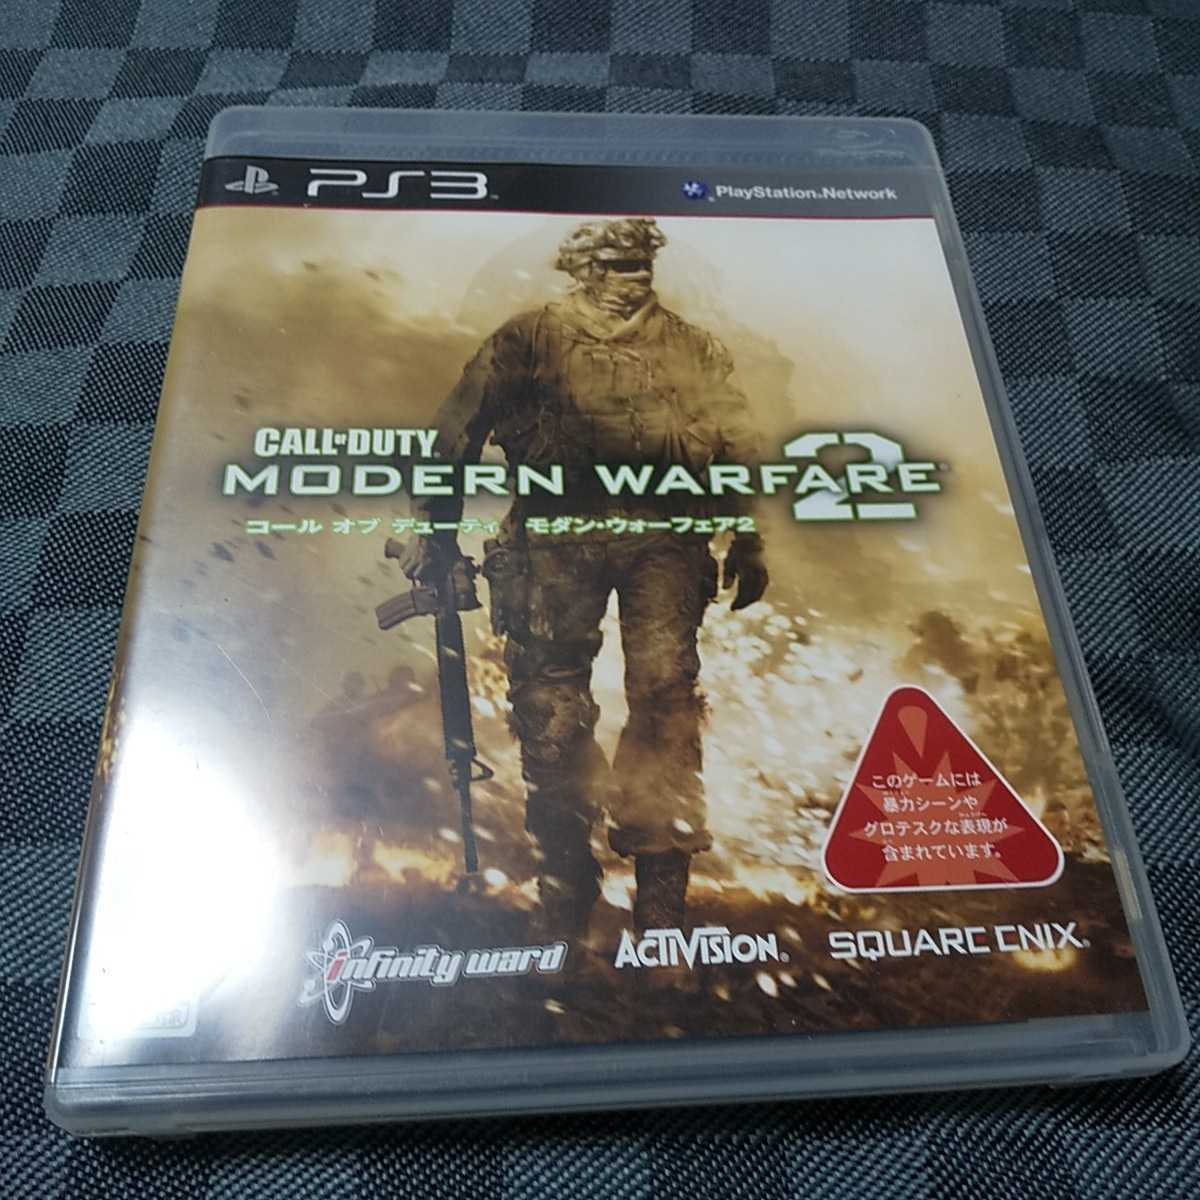 PS3【コールオブデューティモダン・ウォーフェア2】スクウェア・エニックス 暴力シーンあり [送料無料]返金保証あり